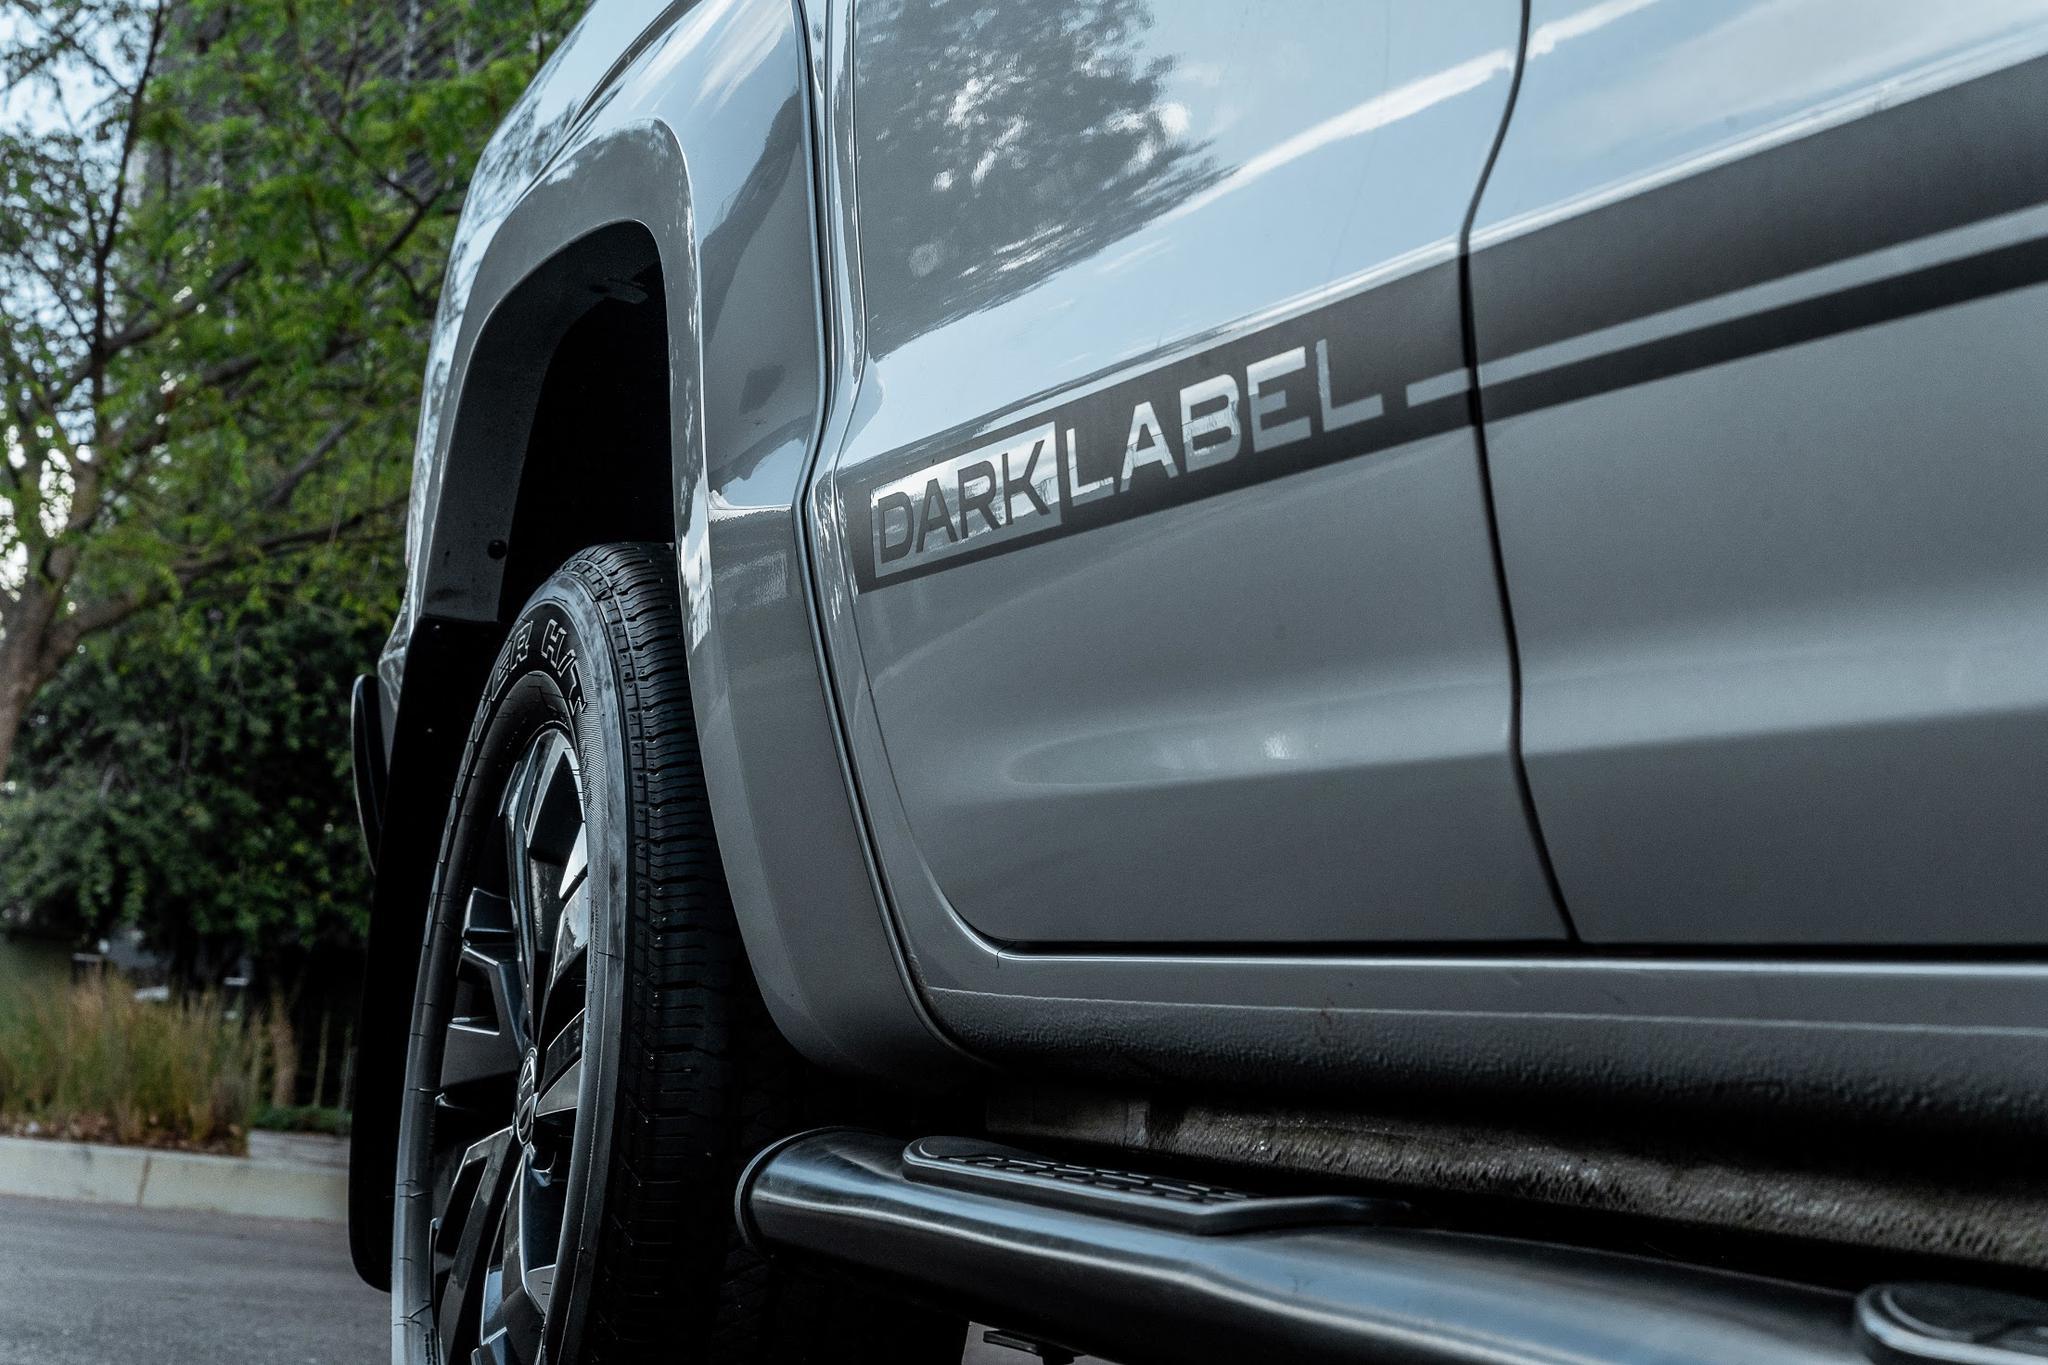 The Volkswagen Amarok Dark Label